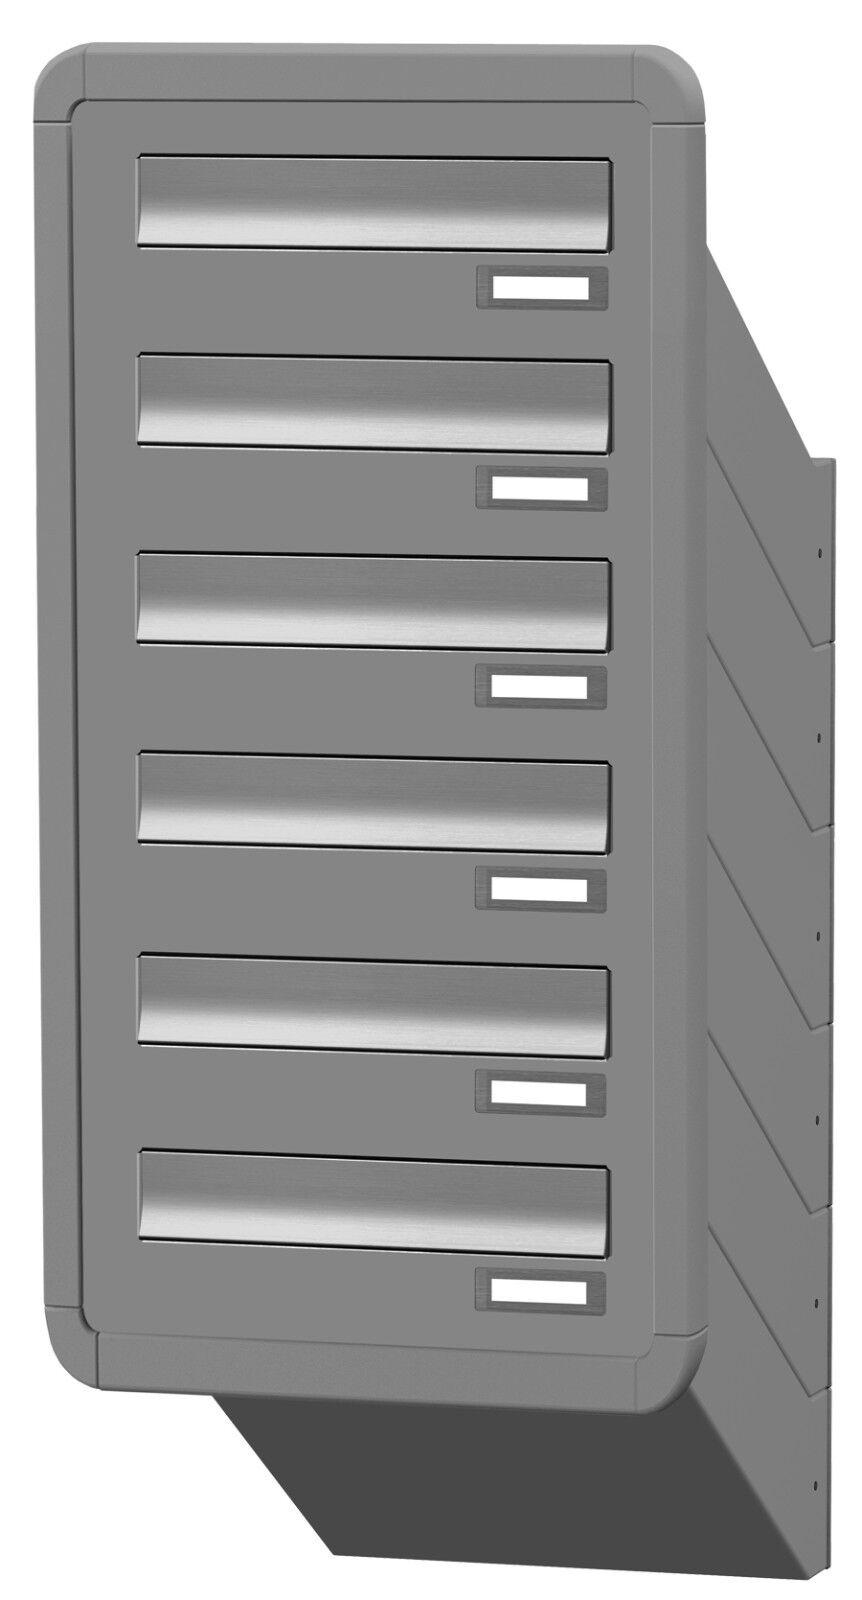 Mauerdurchwurf Briefkasten 6 er variable Tiefe Rahmen TE130 Farbauswahl MDH214